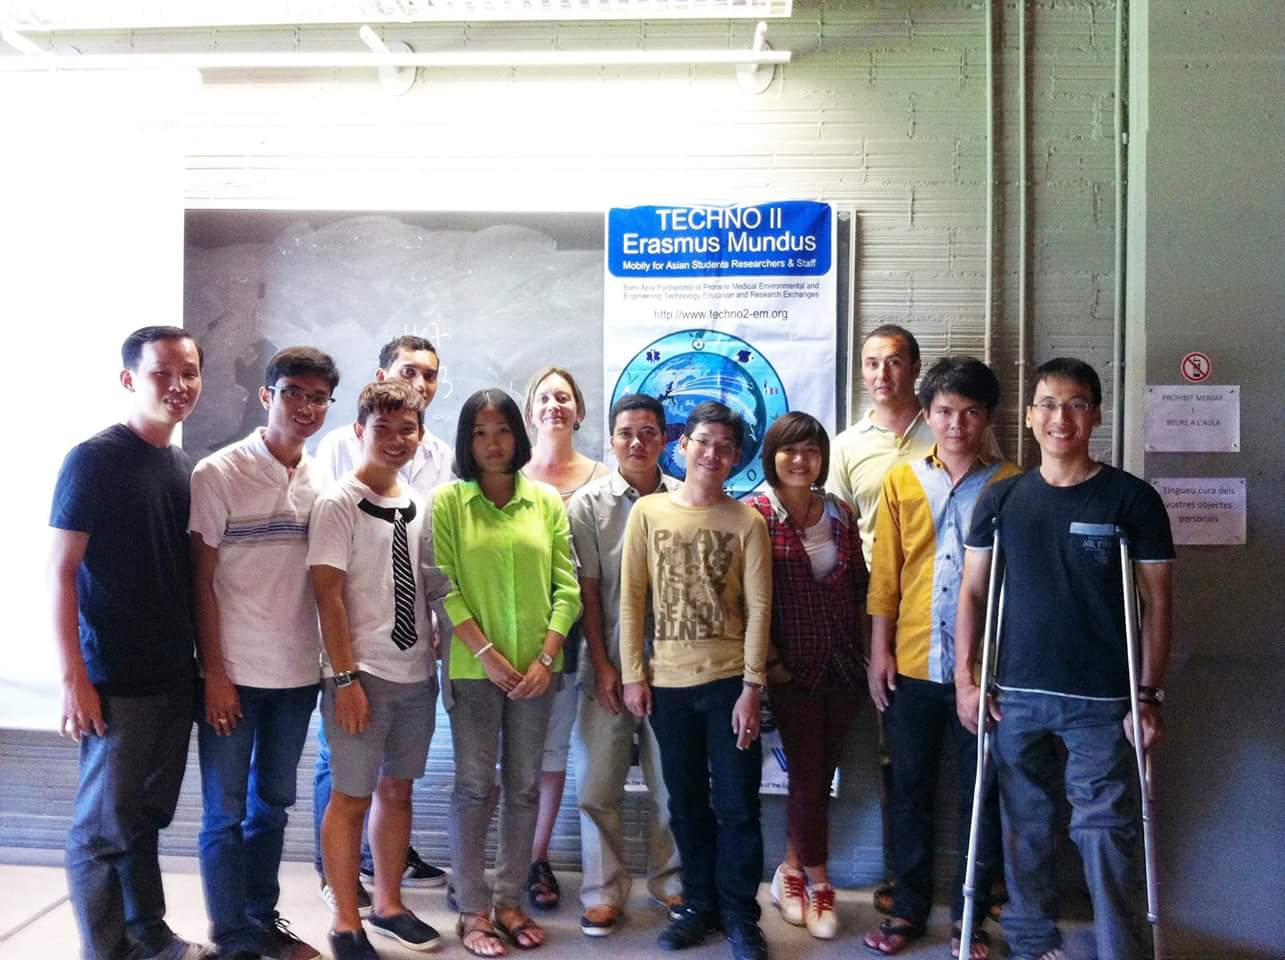 With other Erasmus scholars